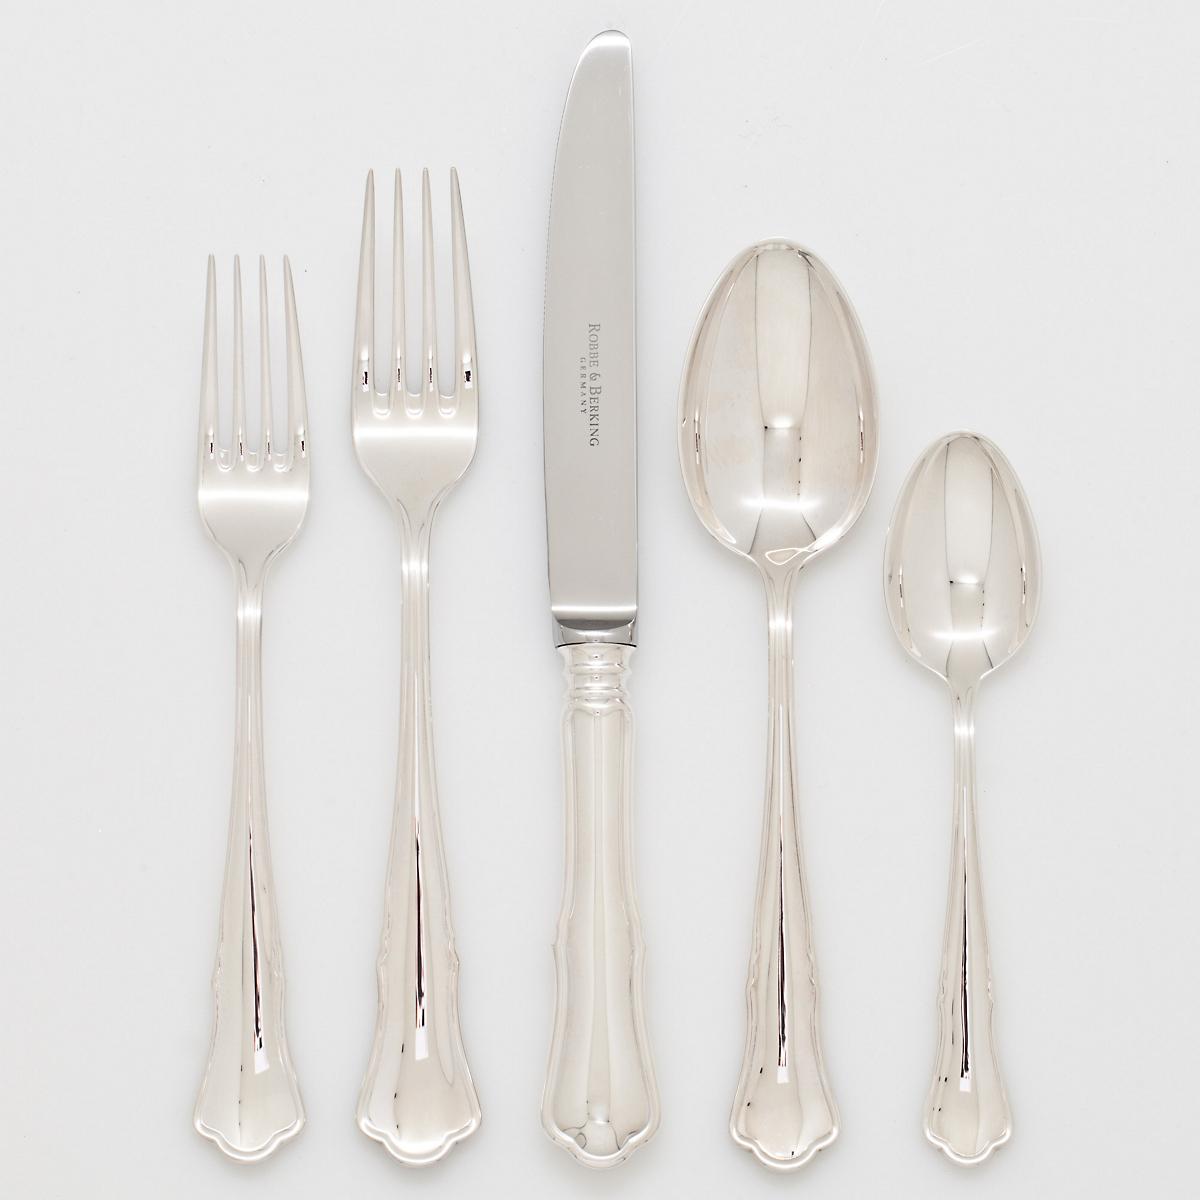 robbe berking alt silver plate chippendale flatware gump 39 s. Black Bedroom Furniture Sets. Home Design Ideas